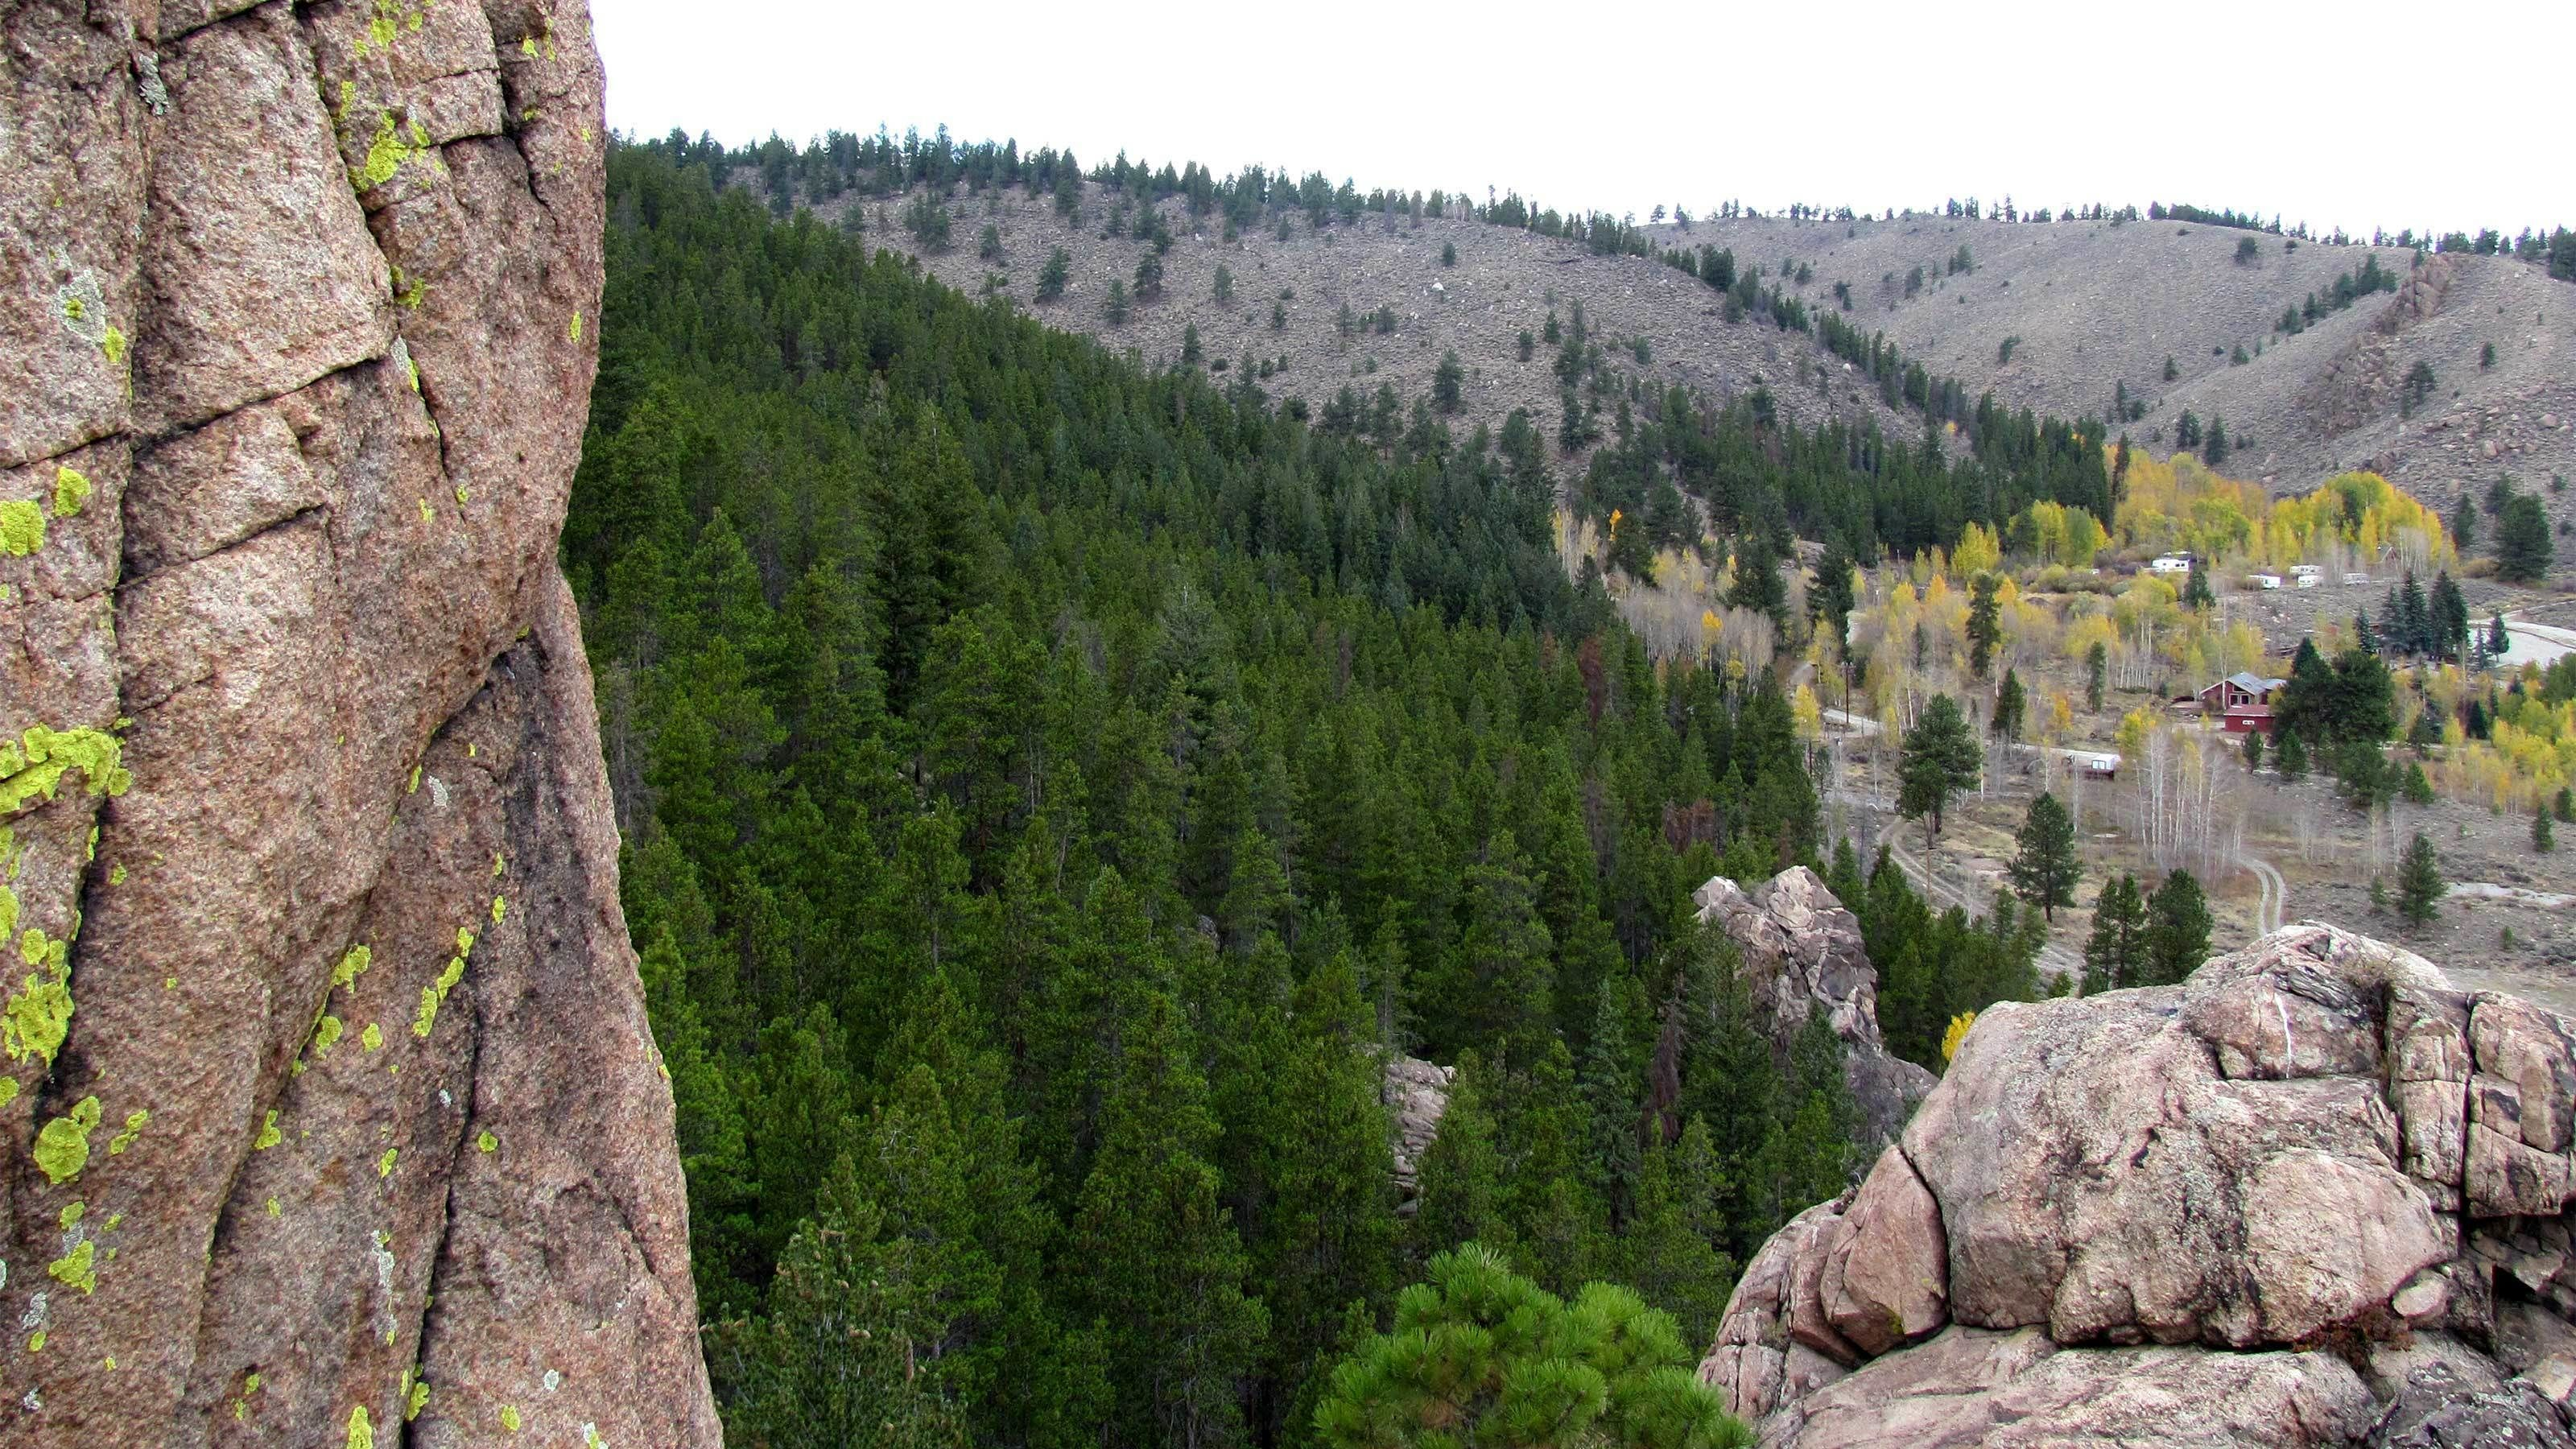 Rocky and wooded landscape in Denver